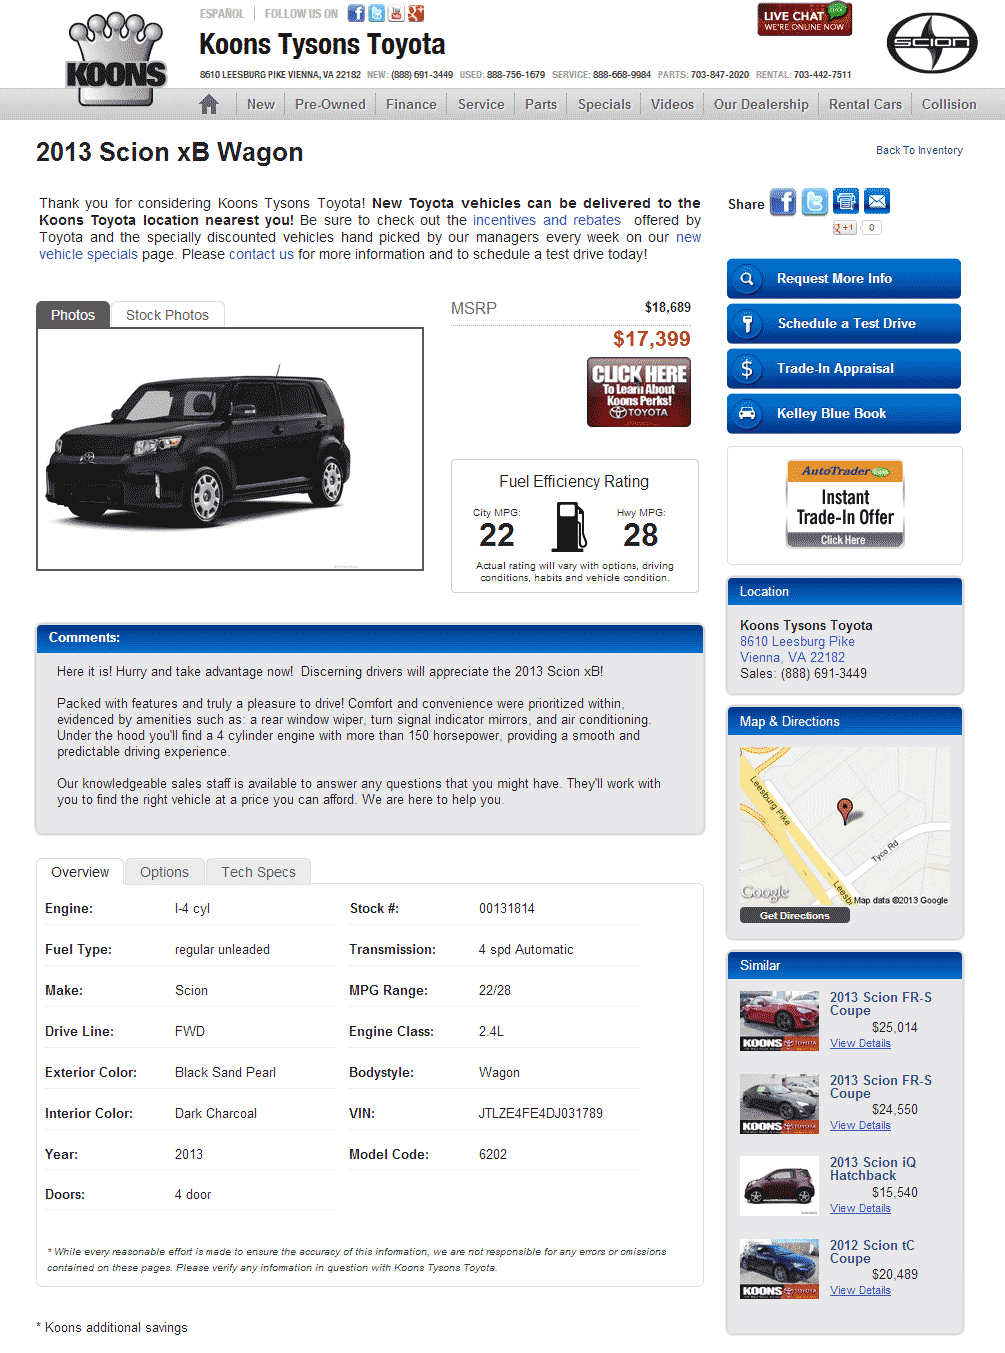 2013 Scion Xb Real Dealer Prices Free Costhelper Com